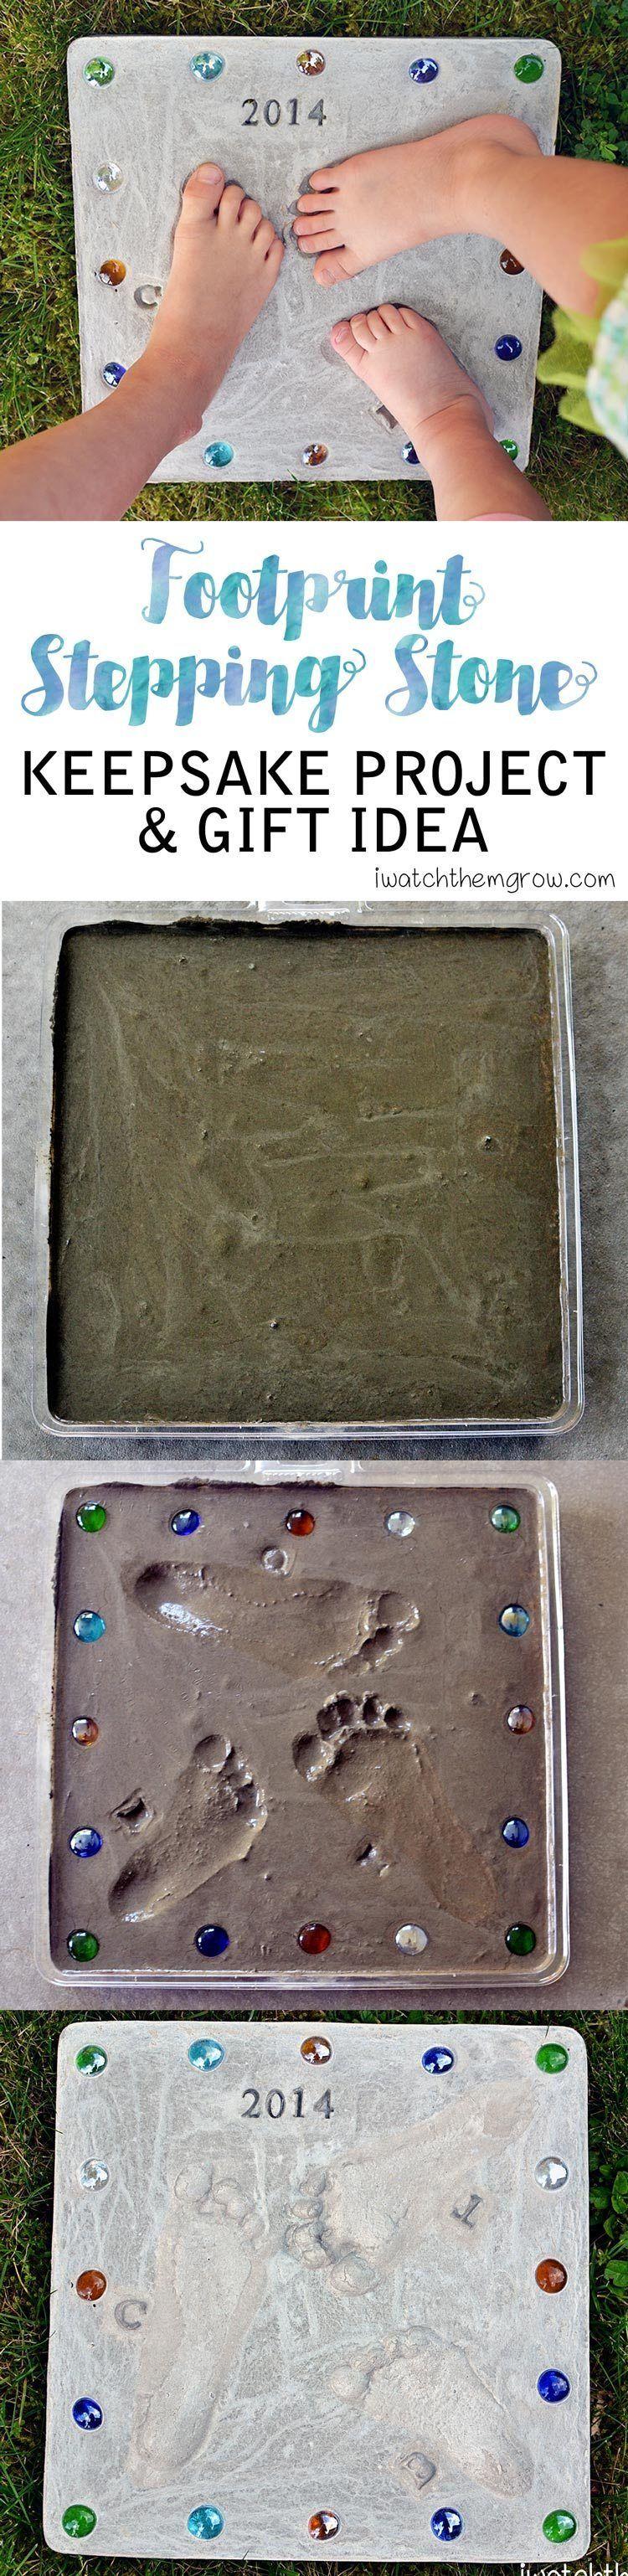 Footprint Stepping Stone